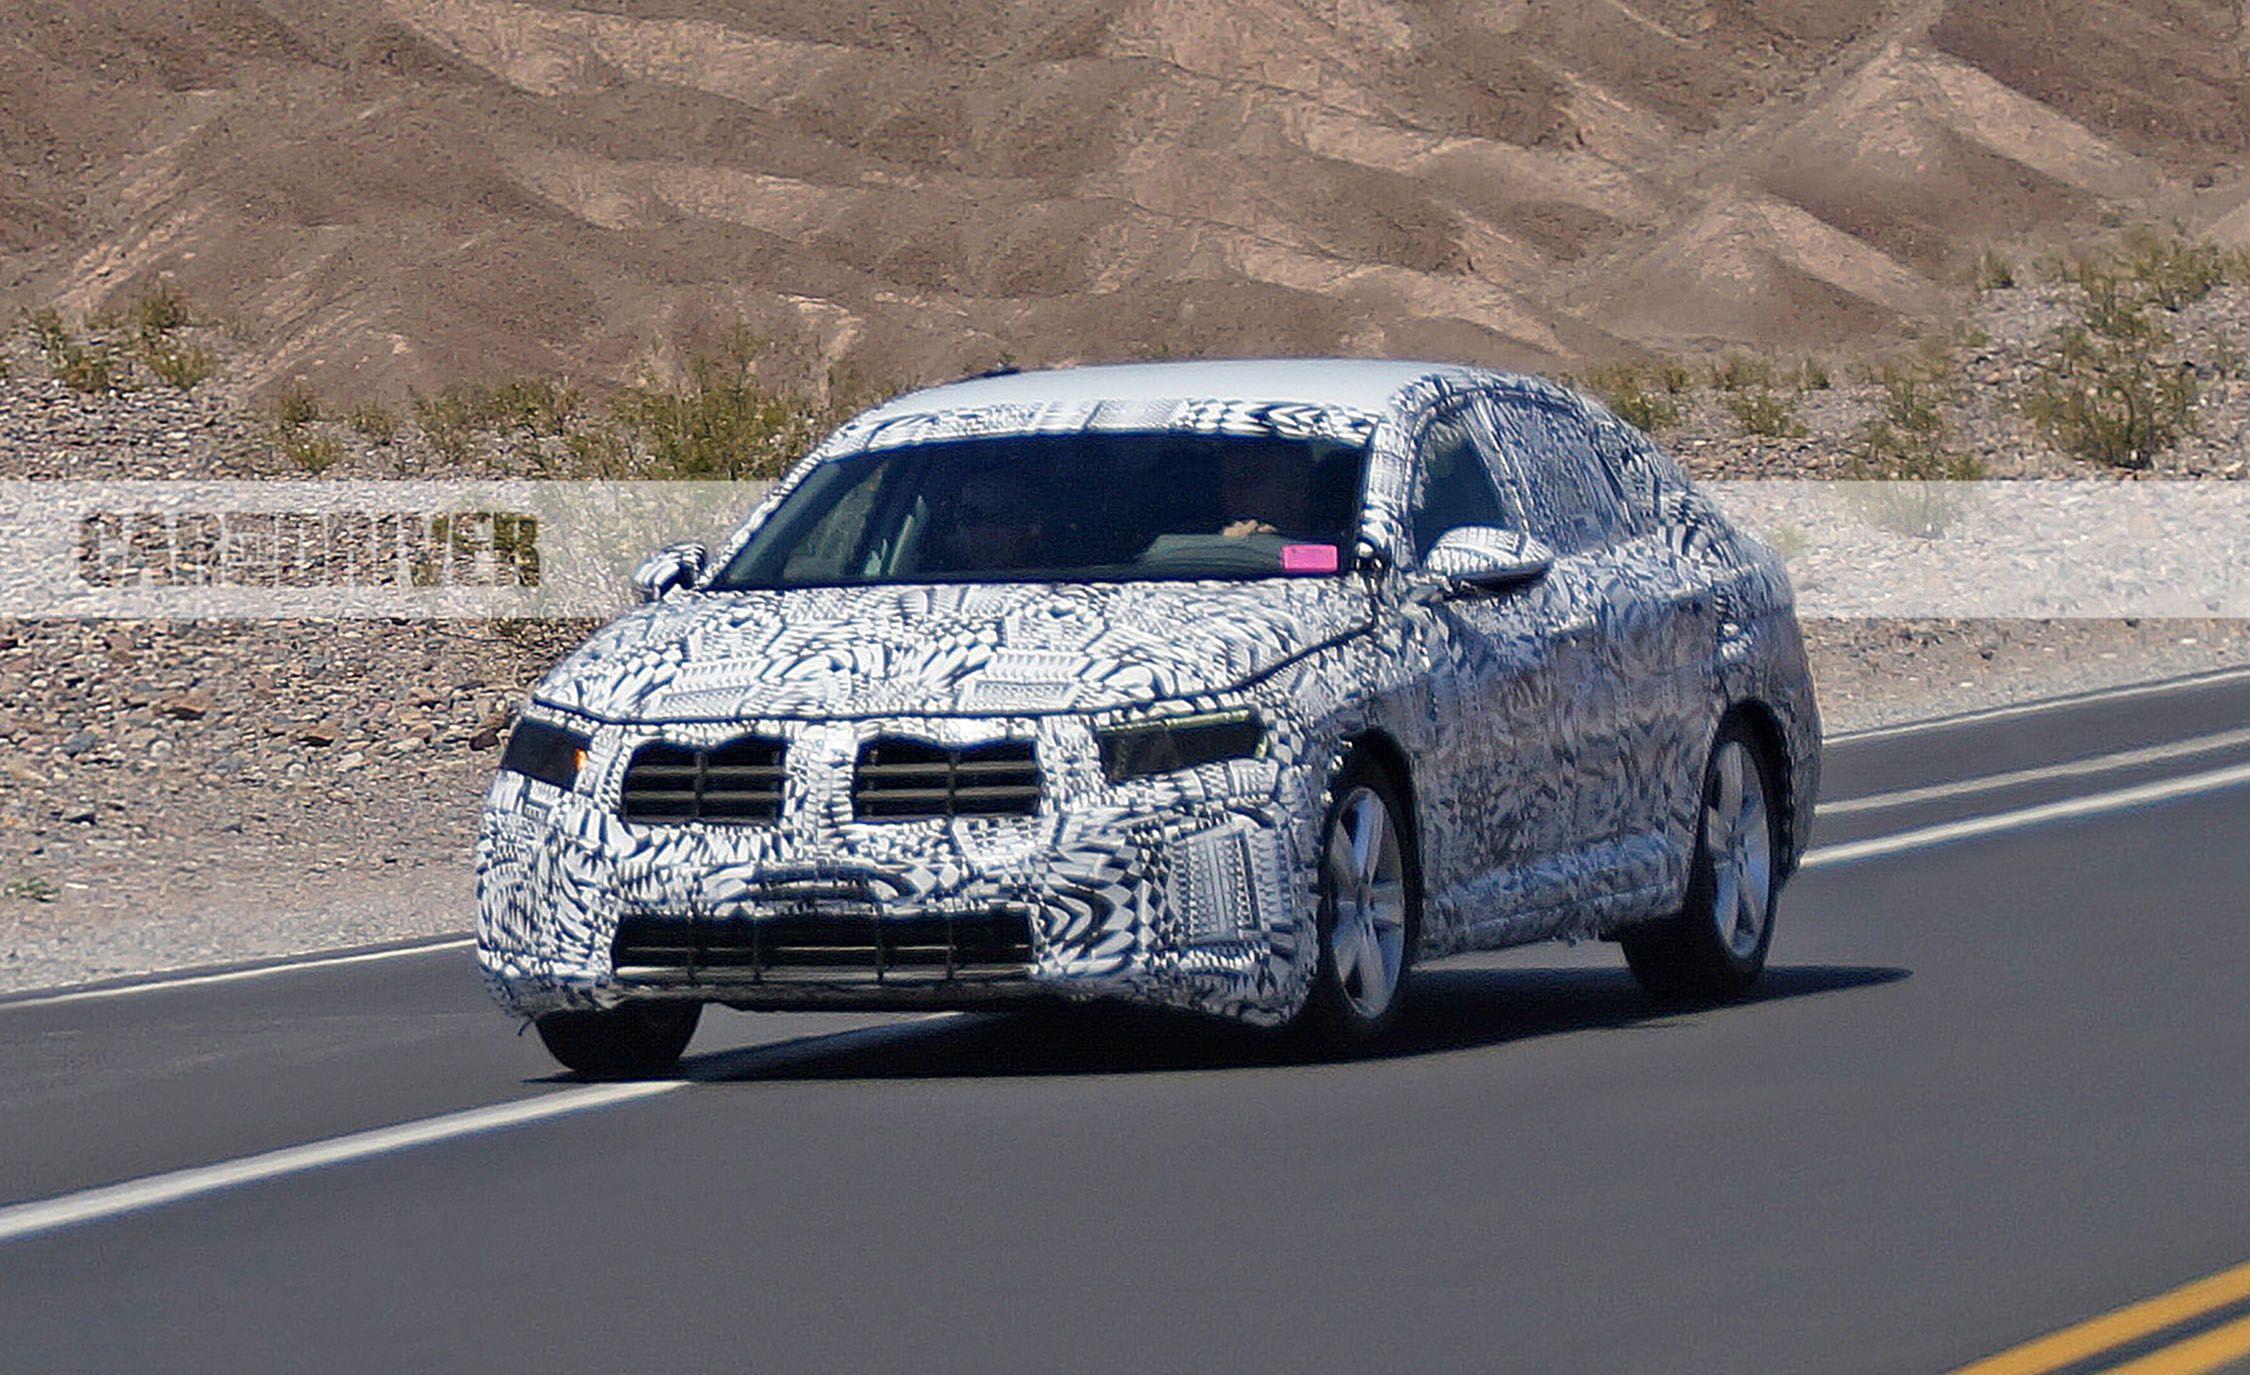 2019 Volkswagen Jetta Spy Photos News Car And Driver